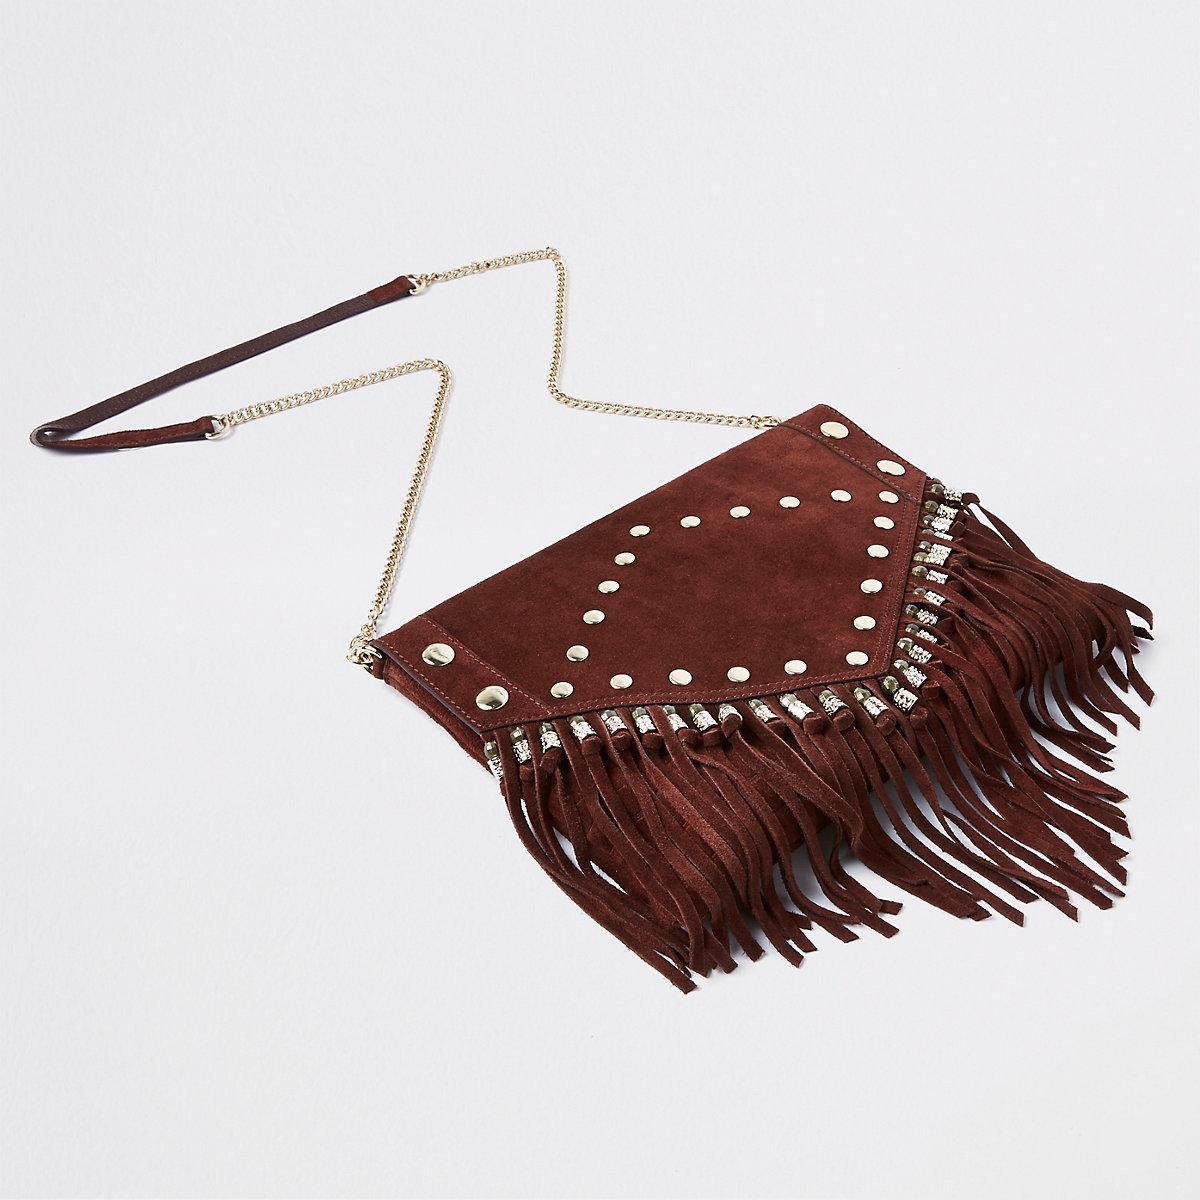 Red leather studded tassel clutch bag